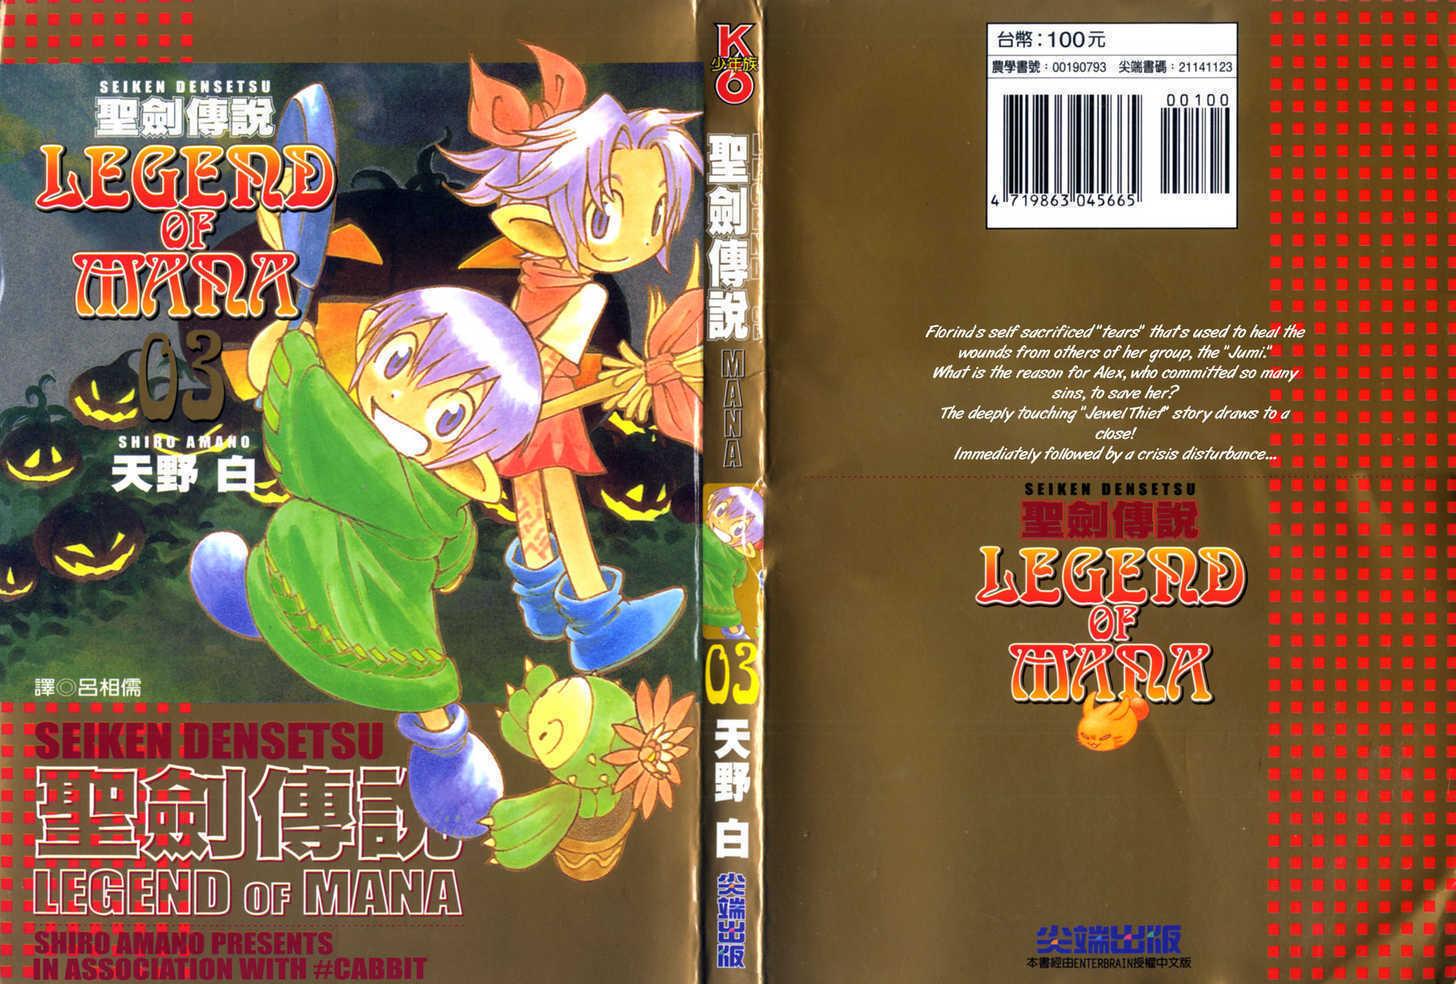 Seiken Densetsu: Legend of Mana 13 Page 1